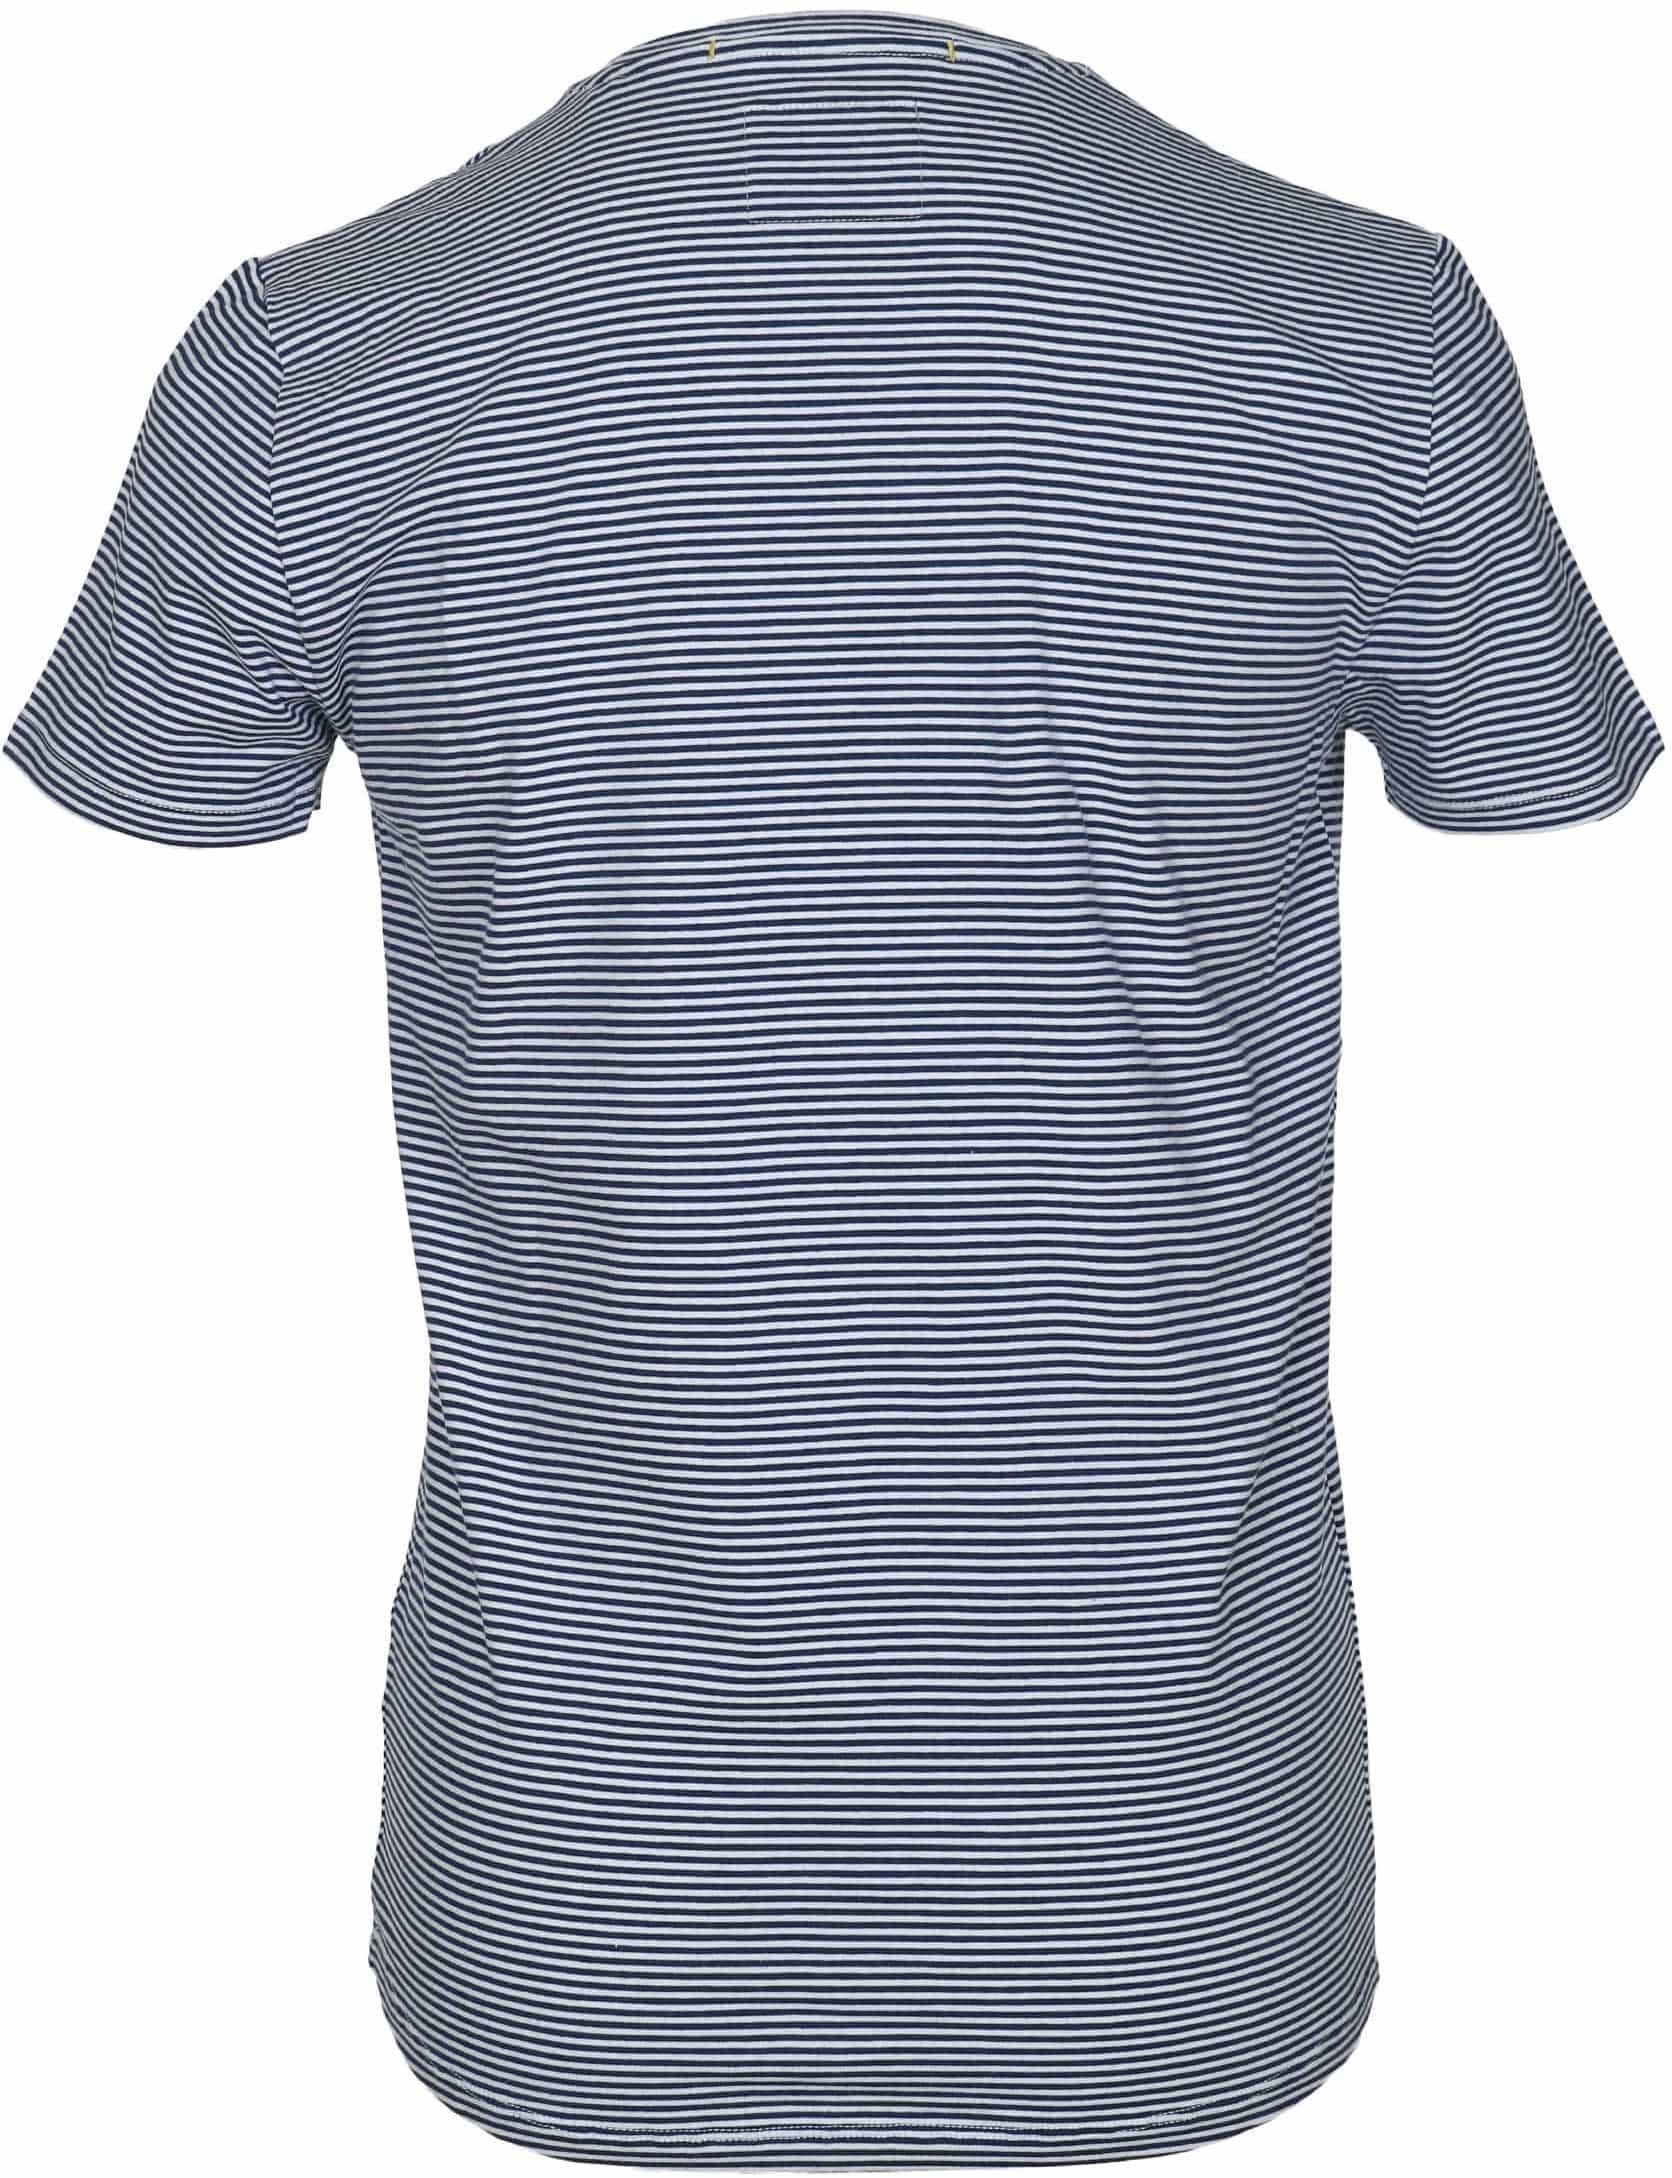 No-Excess T-shirt Navy Streep foto 2